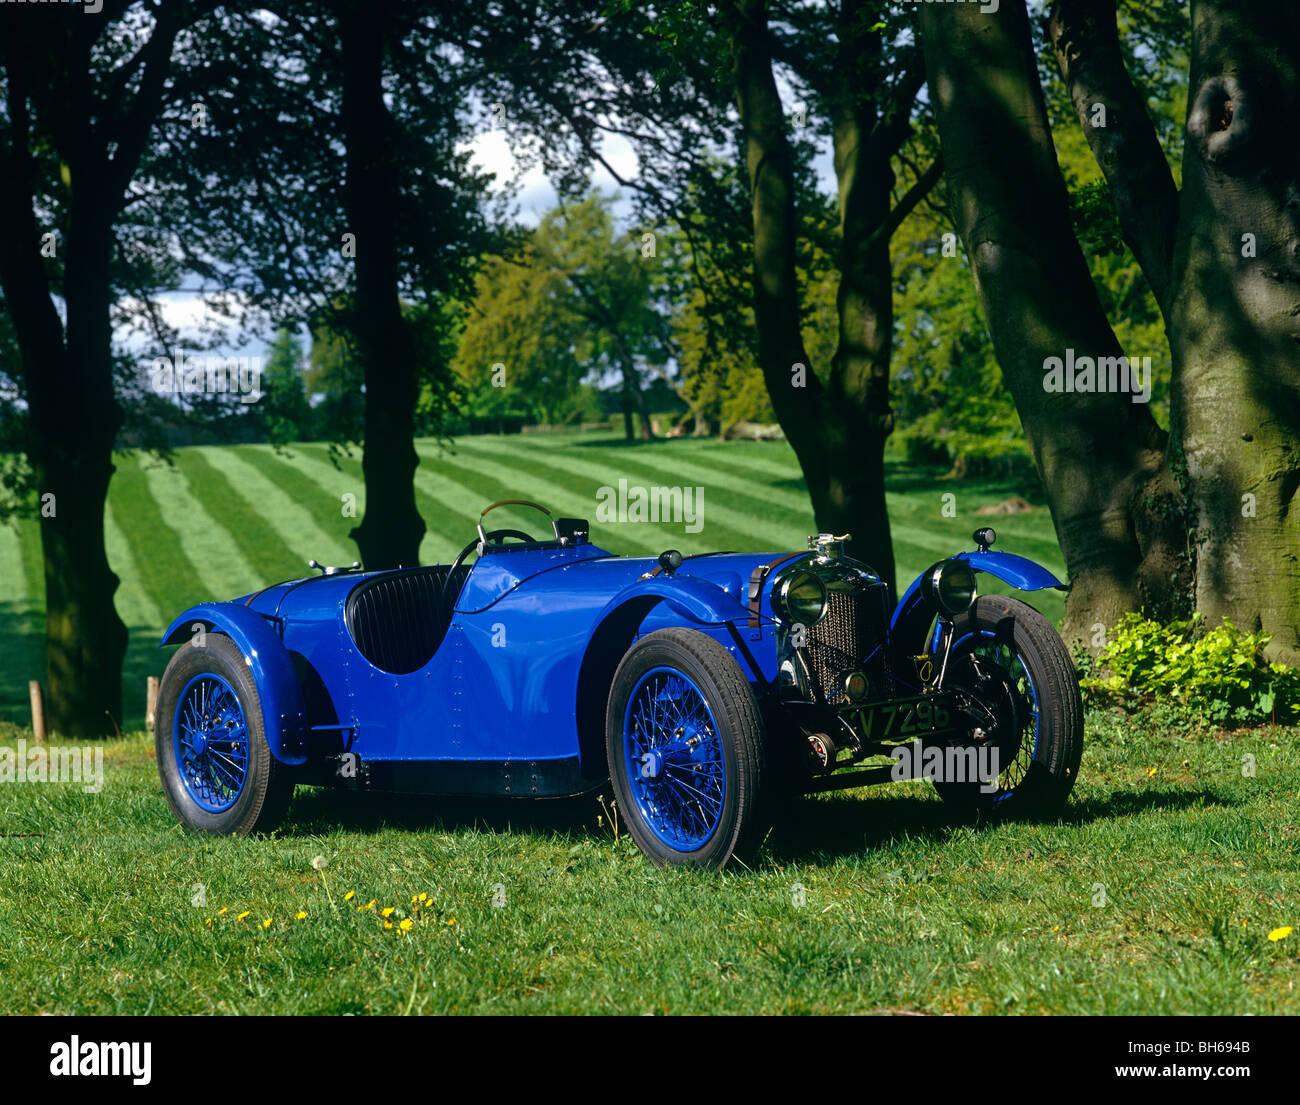 Vintage Car, Riley - Stock Image